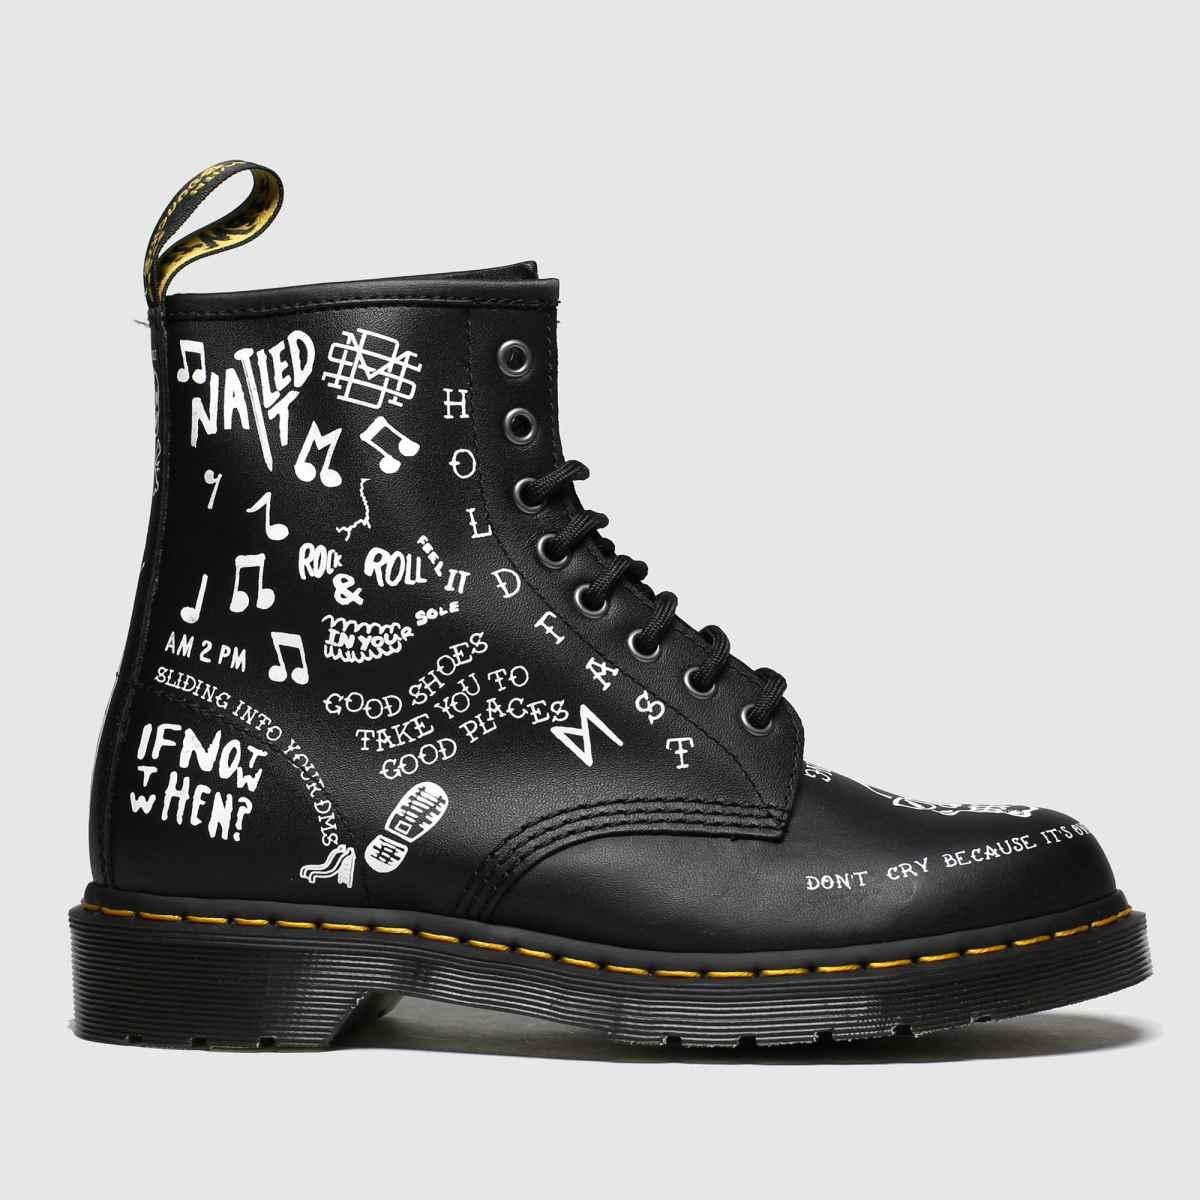 Dr Martens Black & White 1460 Scribble Boots